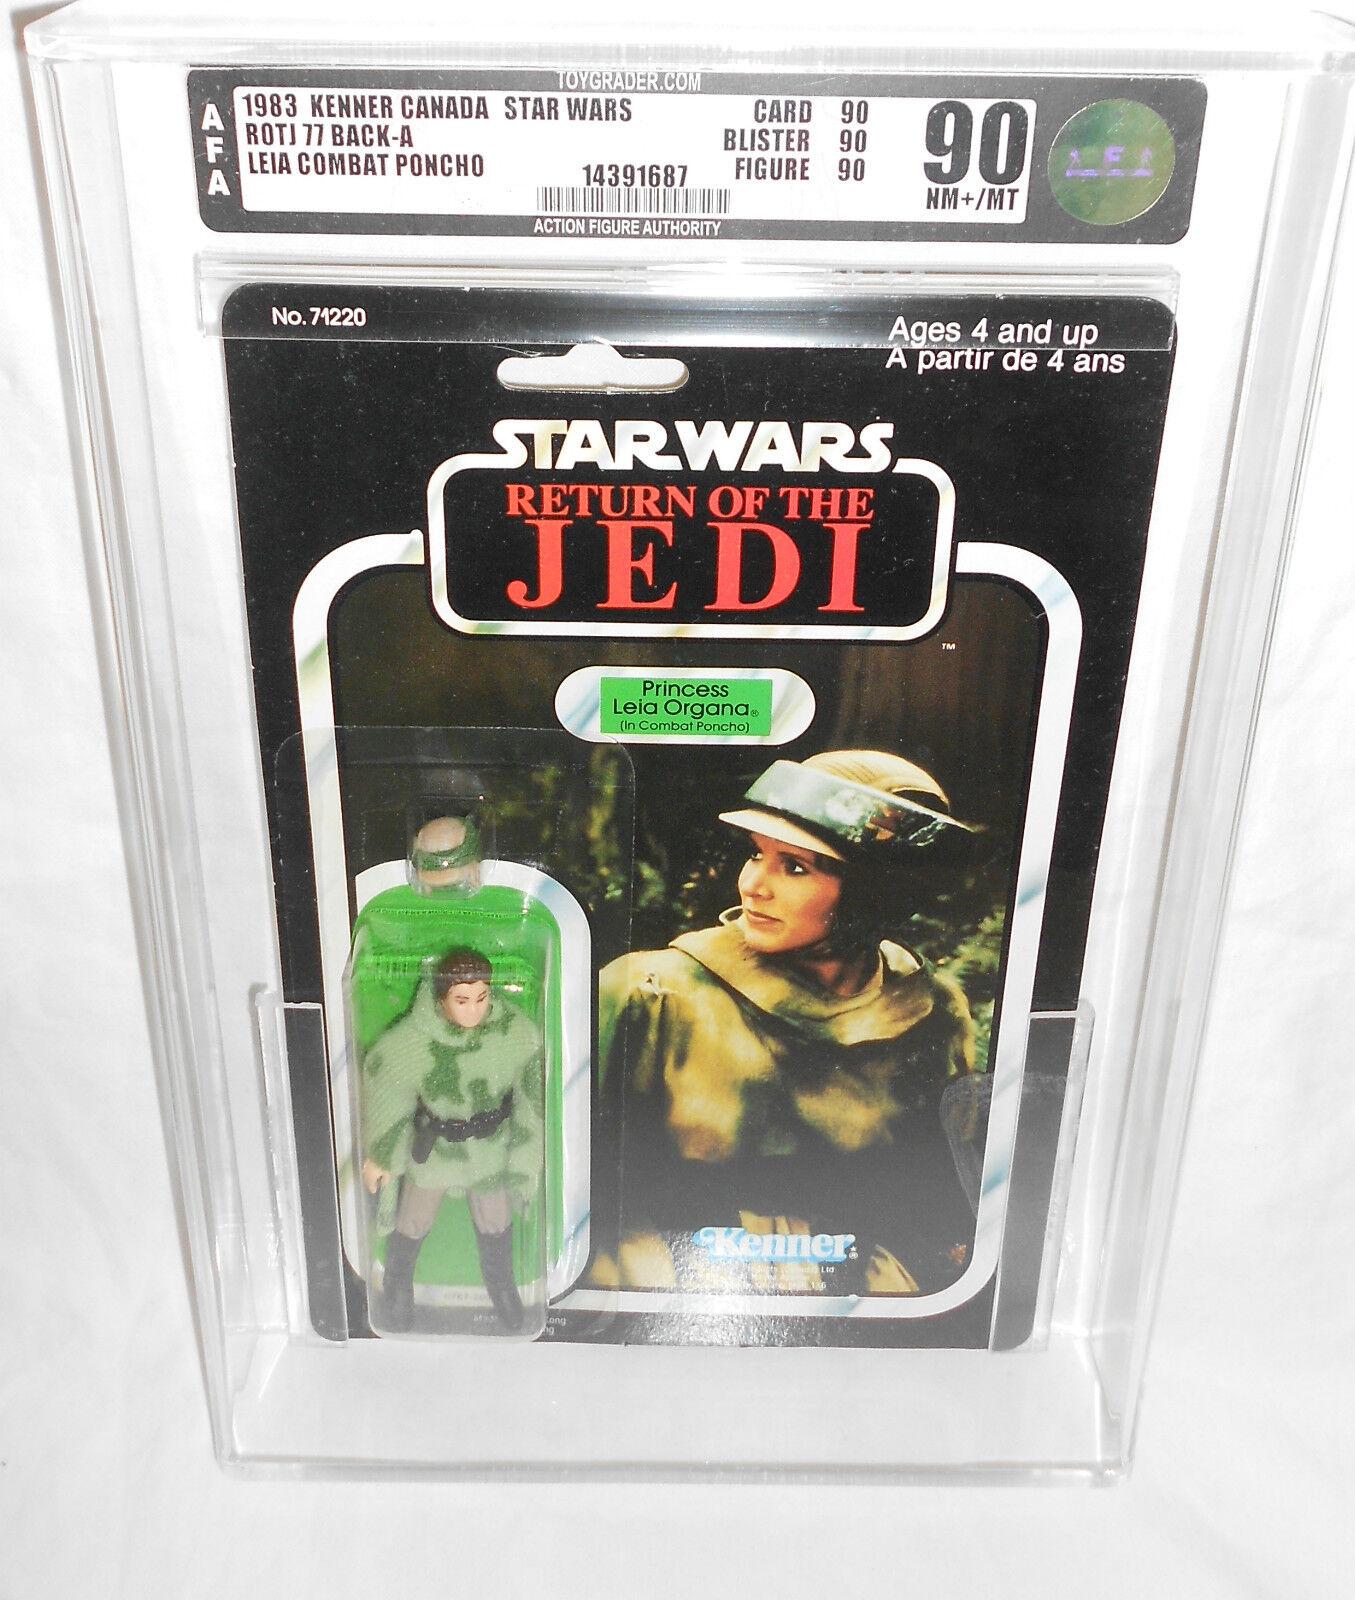 Vintage Star Wars Leia Combat Poncho Afa 90 Transparente 909090 Kenner Canadá